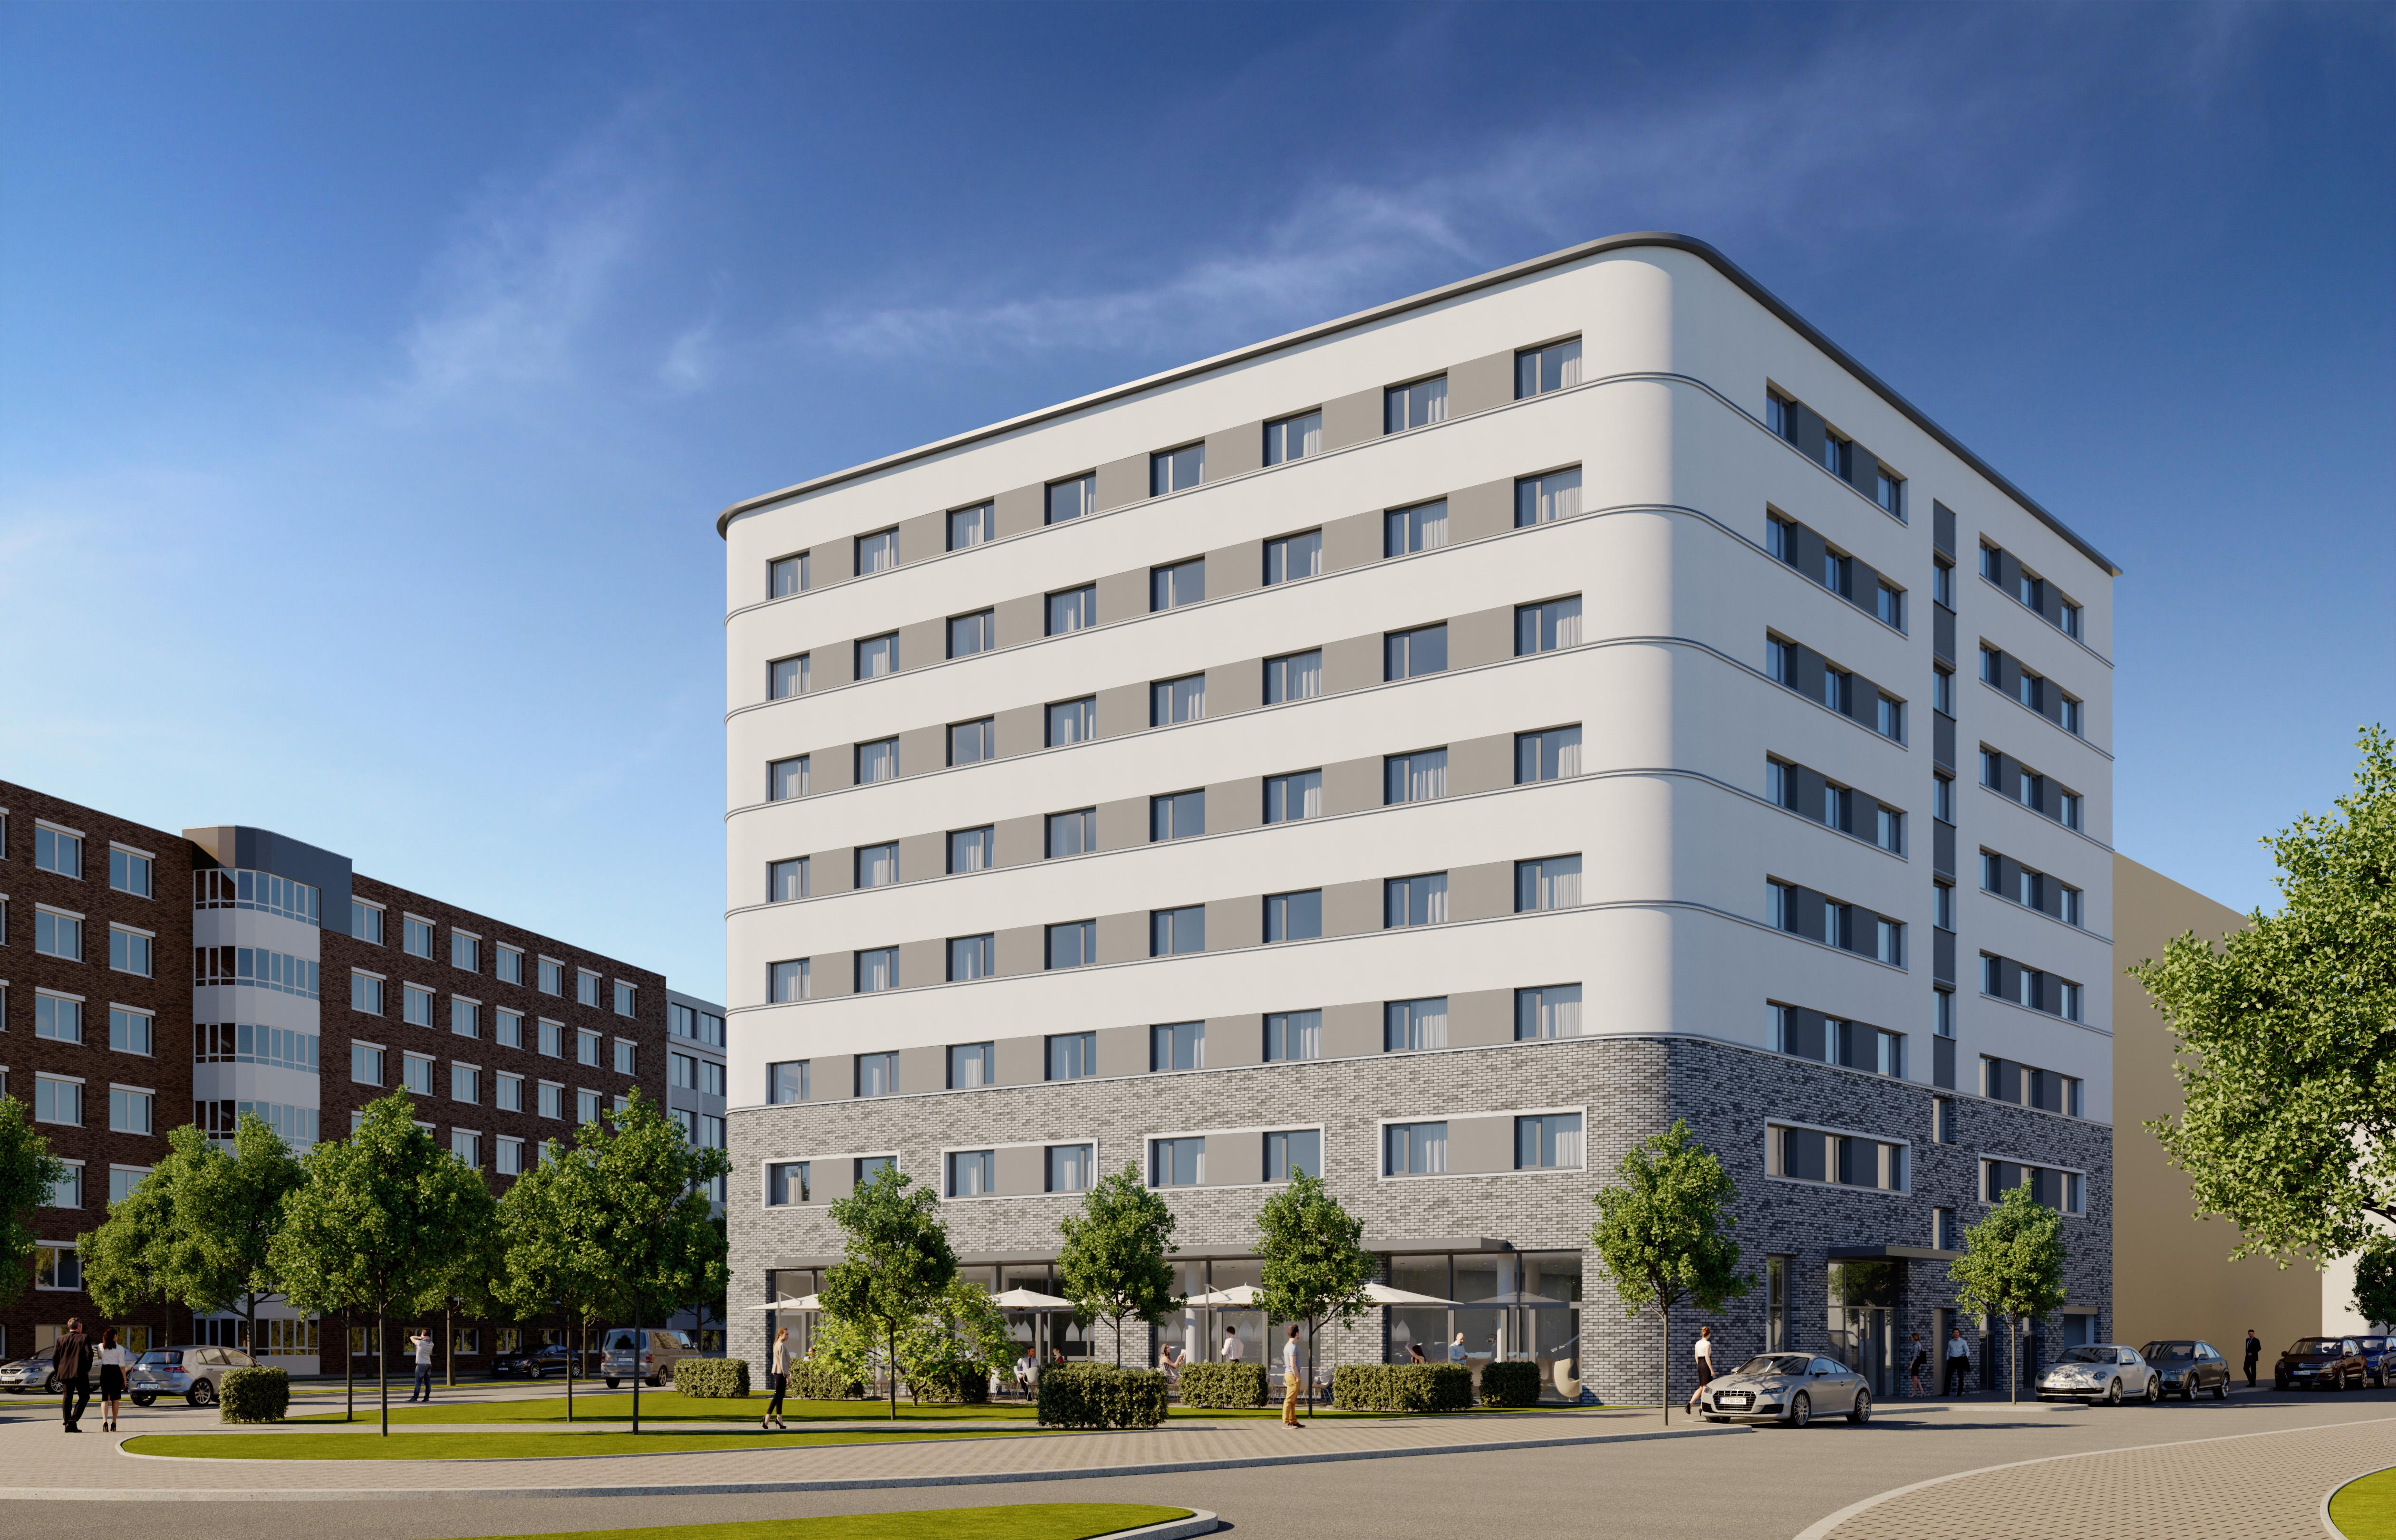 Premier Inn Hotel Saarbrücken